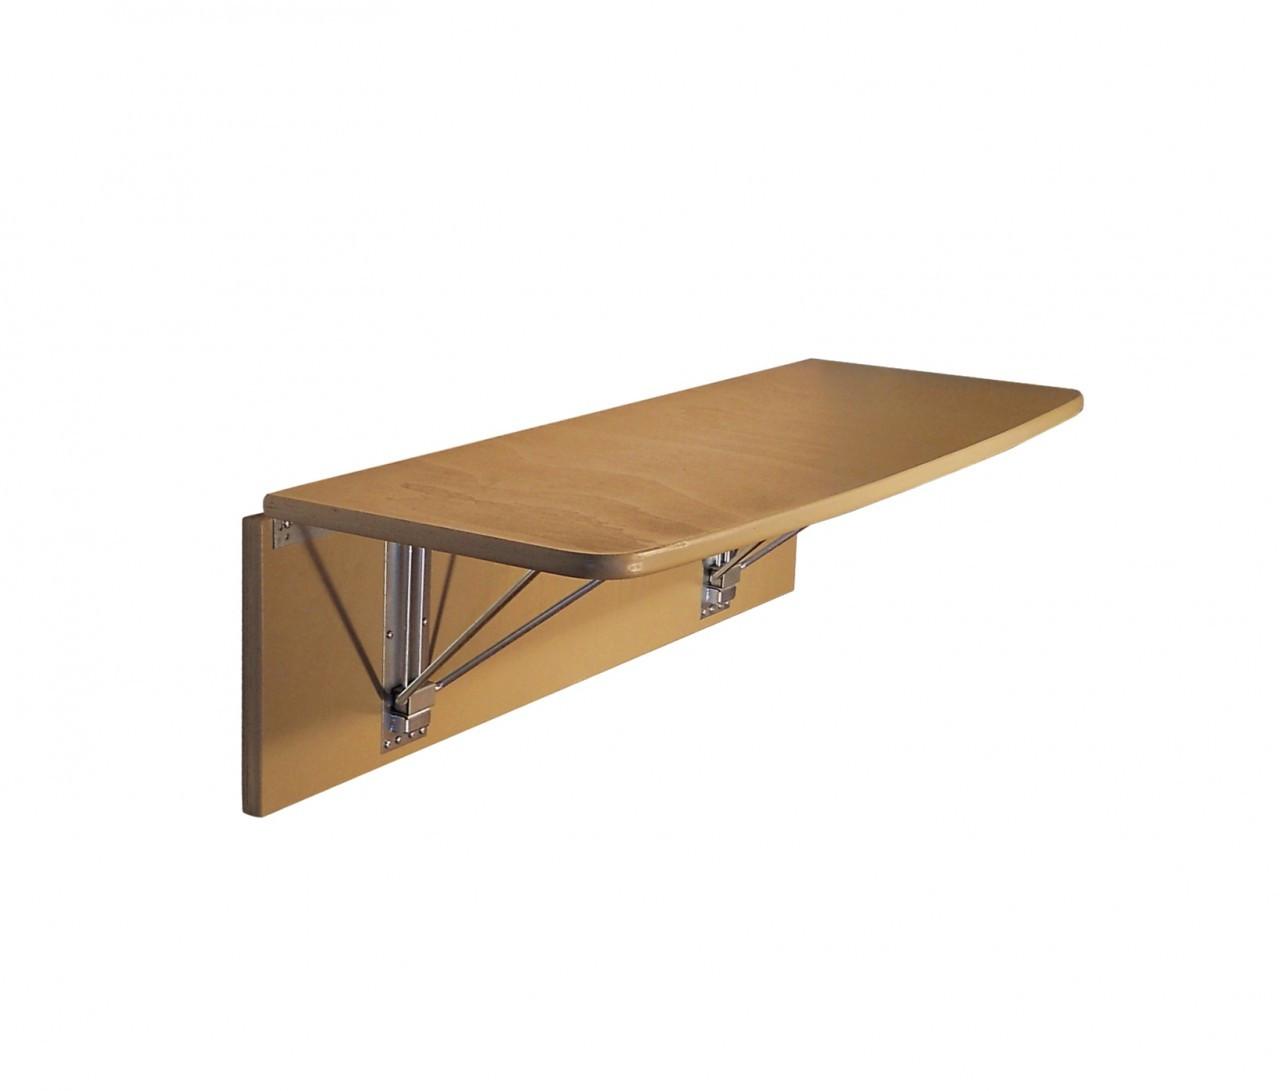 wall mounted fold up chair bench eurekamfg